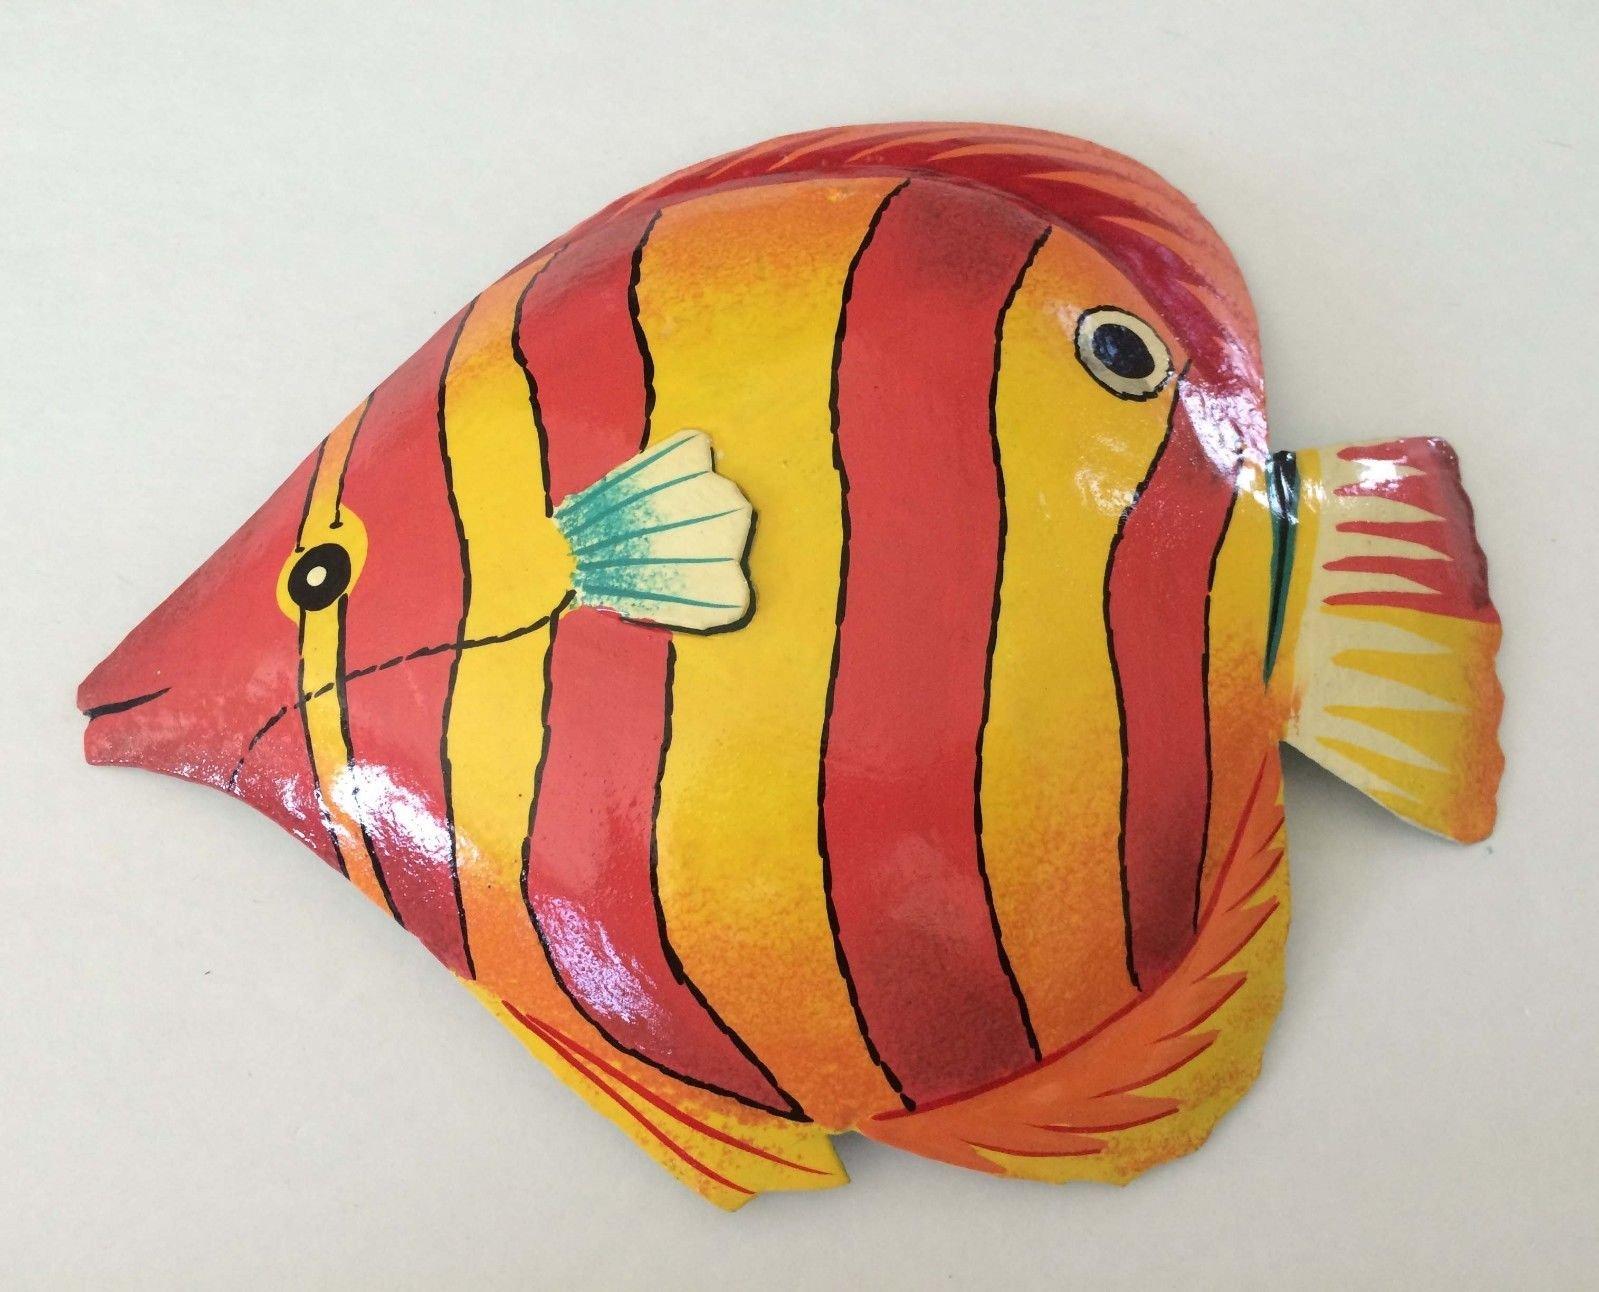 Haitian Crafts Tropical Fish Haitian Metal Art Wall Decor - $18.95 ...